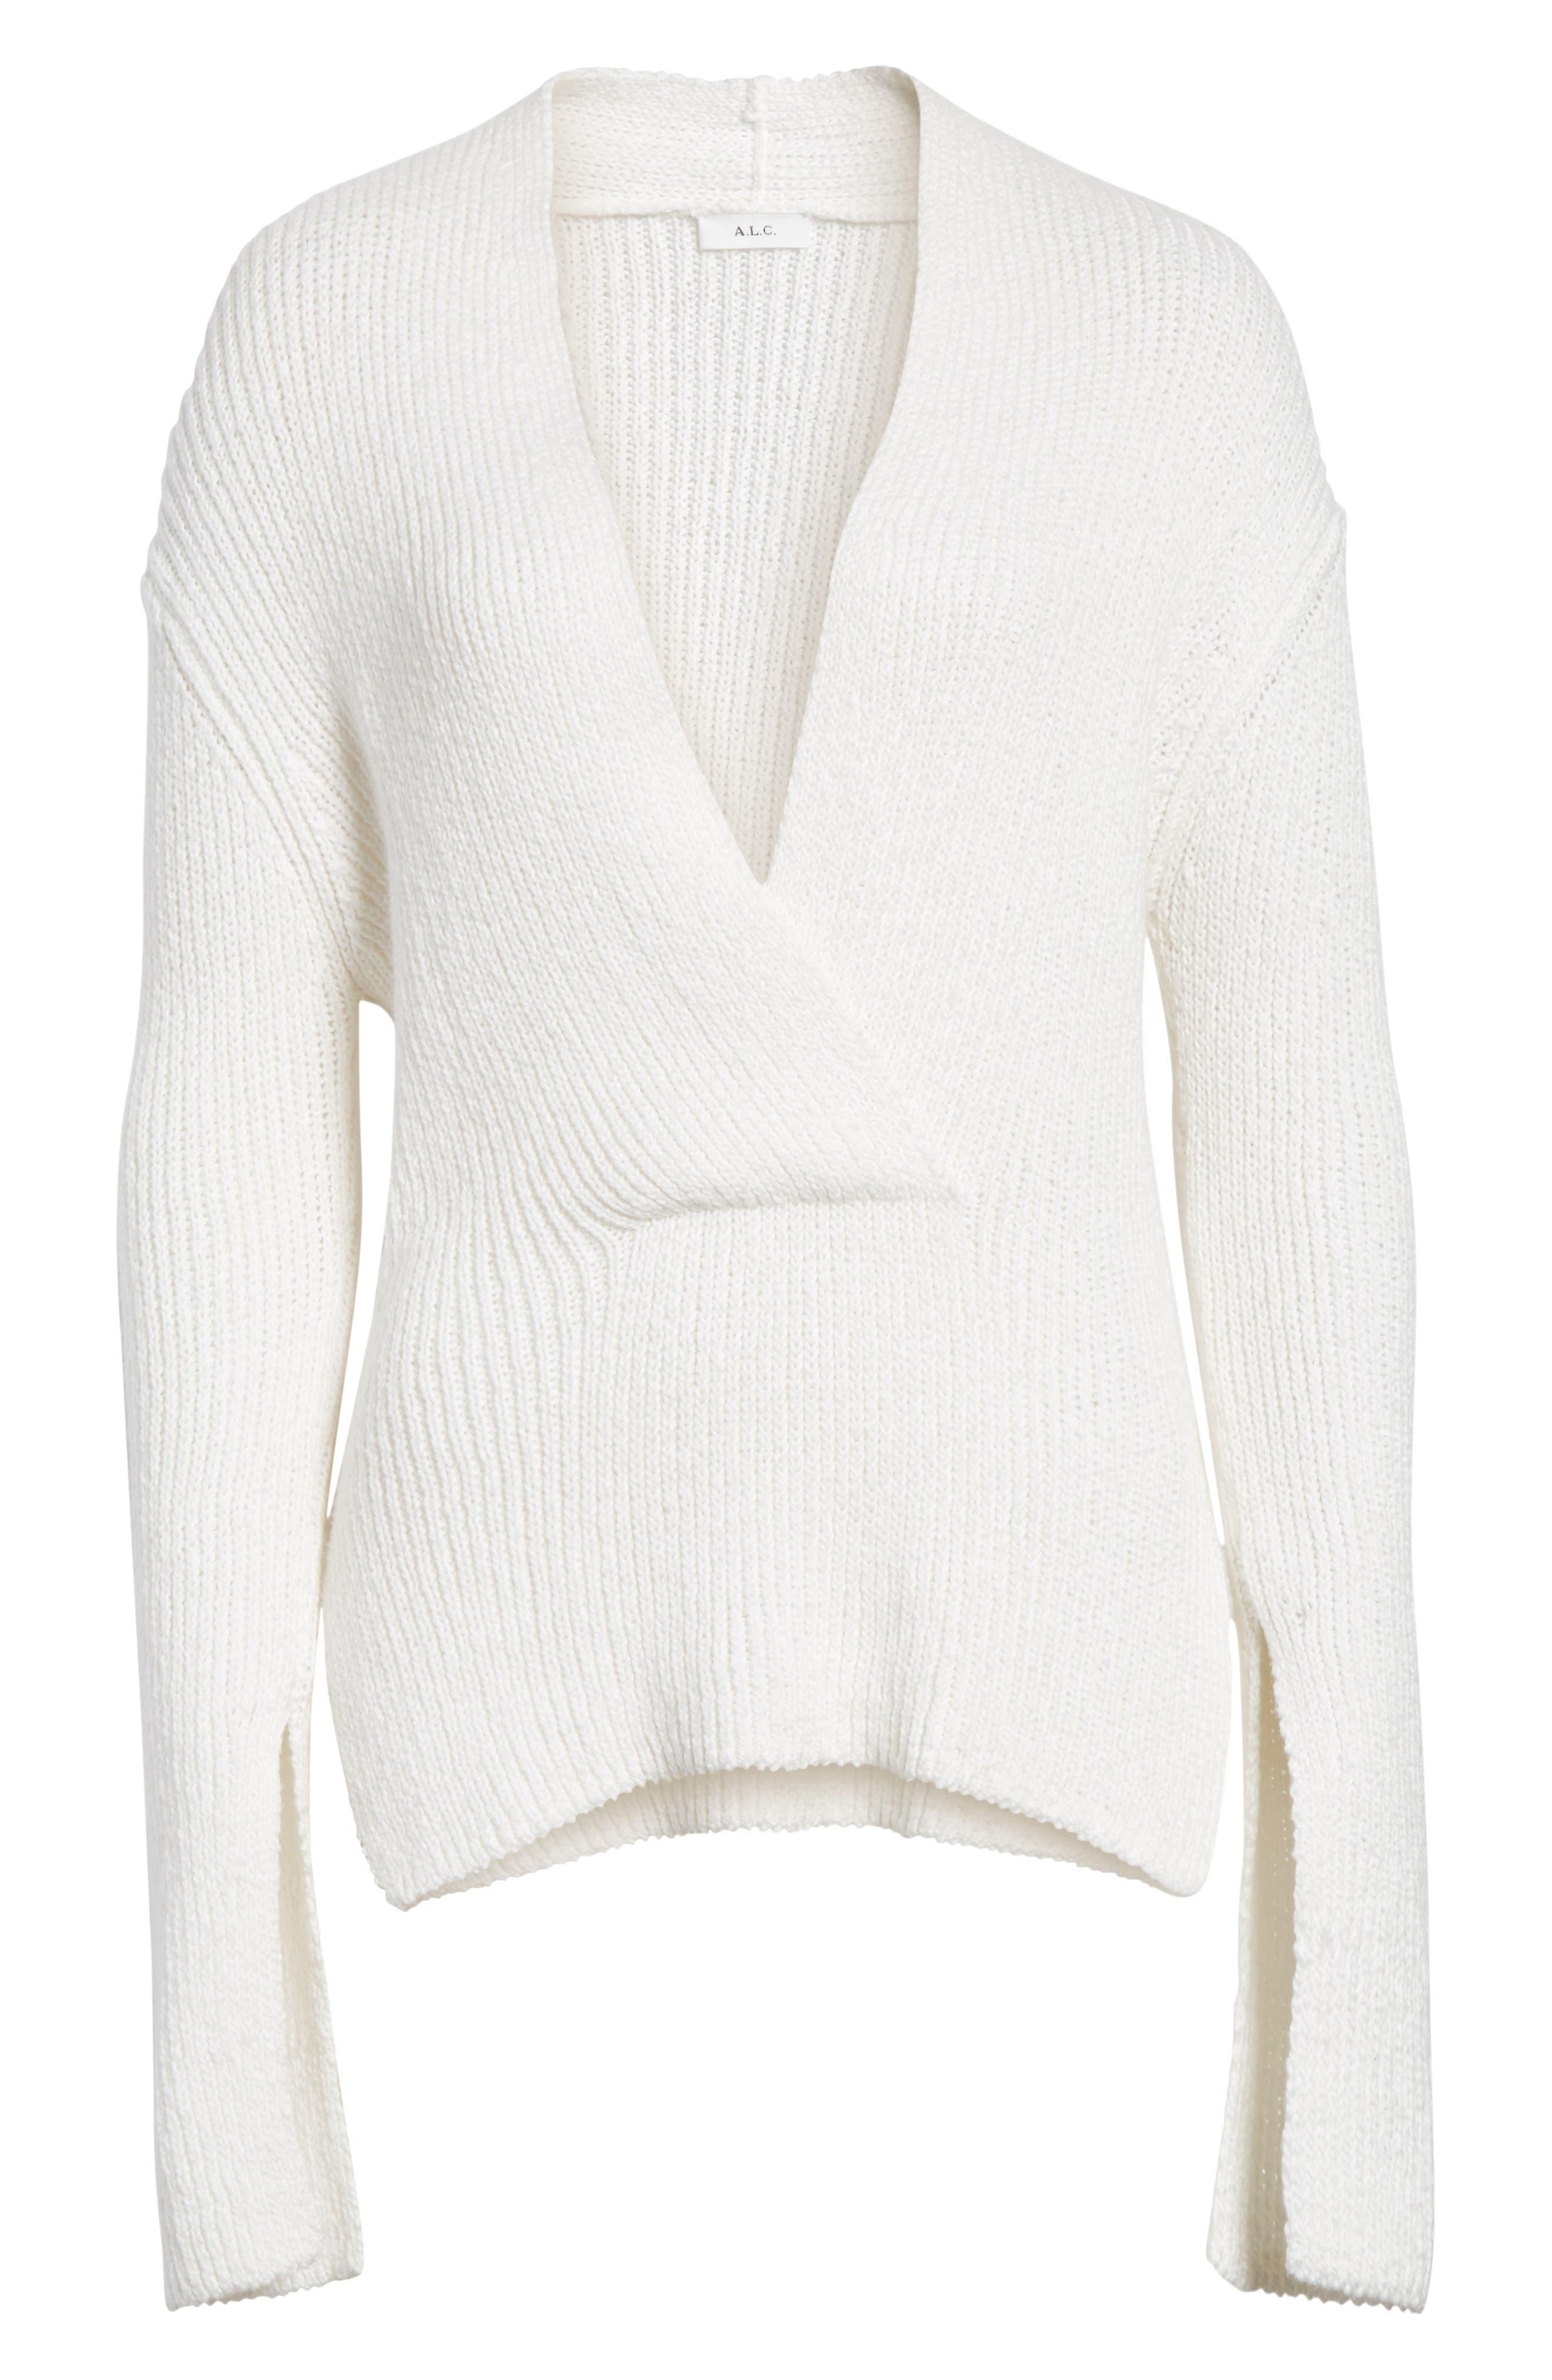 Nick Cotton Sweater,                             Alternate thumbnail 6, color,                             White